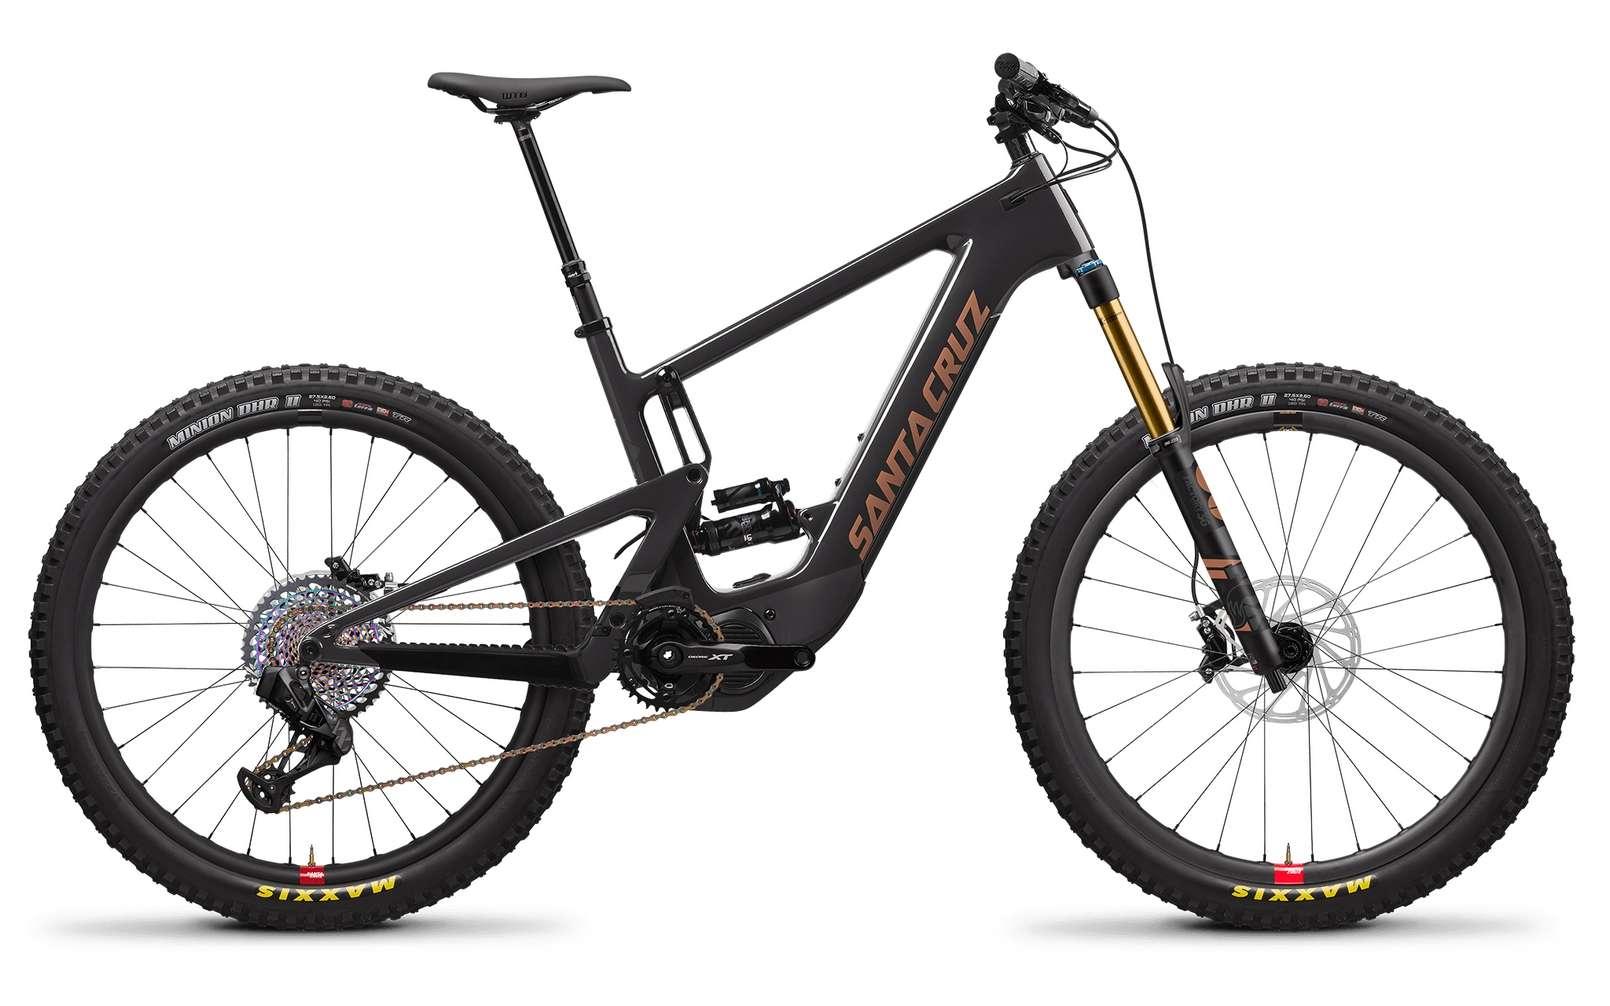 Le Santa Cruz Heckler est la version électrique du Bronson. © Santa Cruz Bicycles